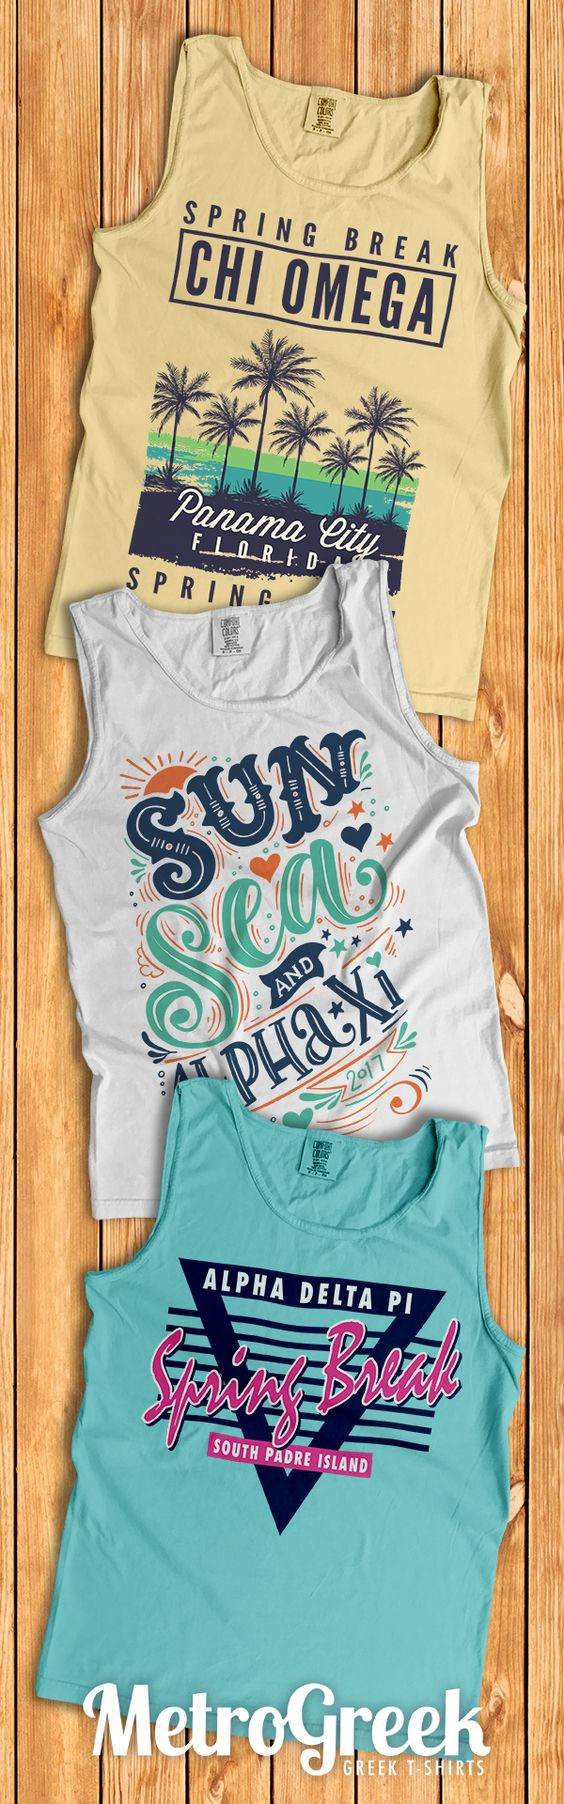 Spring Break T-shirt ideas